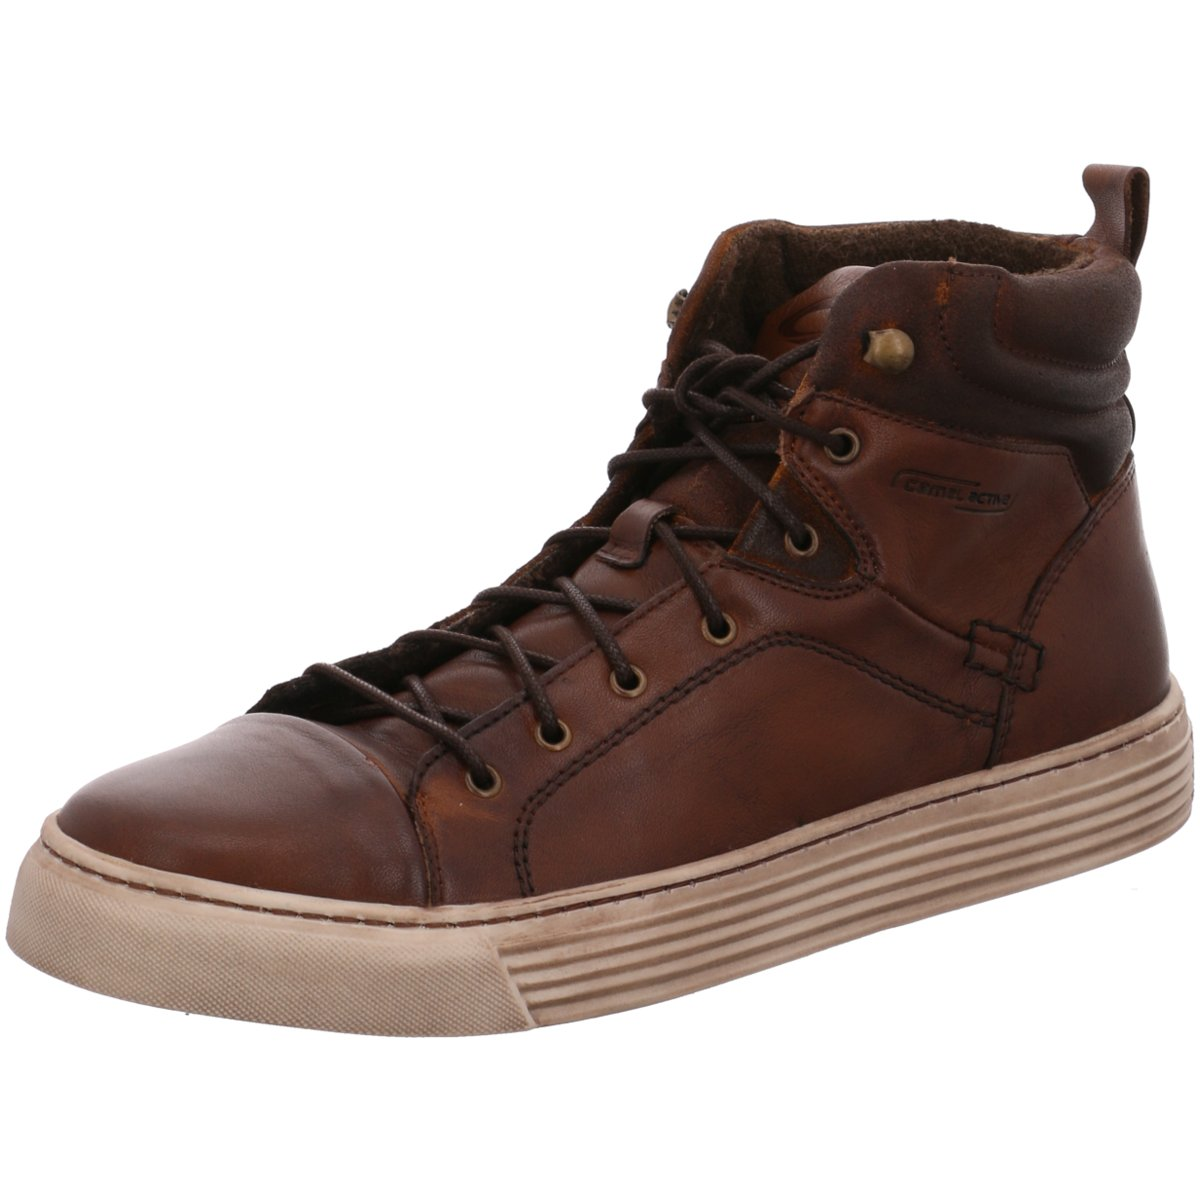 Details zu camel active Herren Sneaker Bowl 4293201 braun 322311